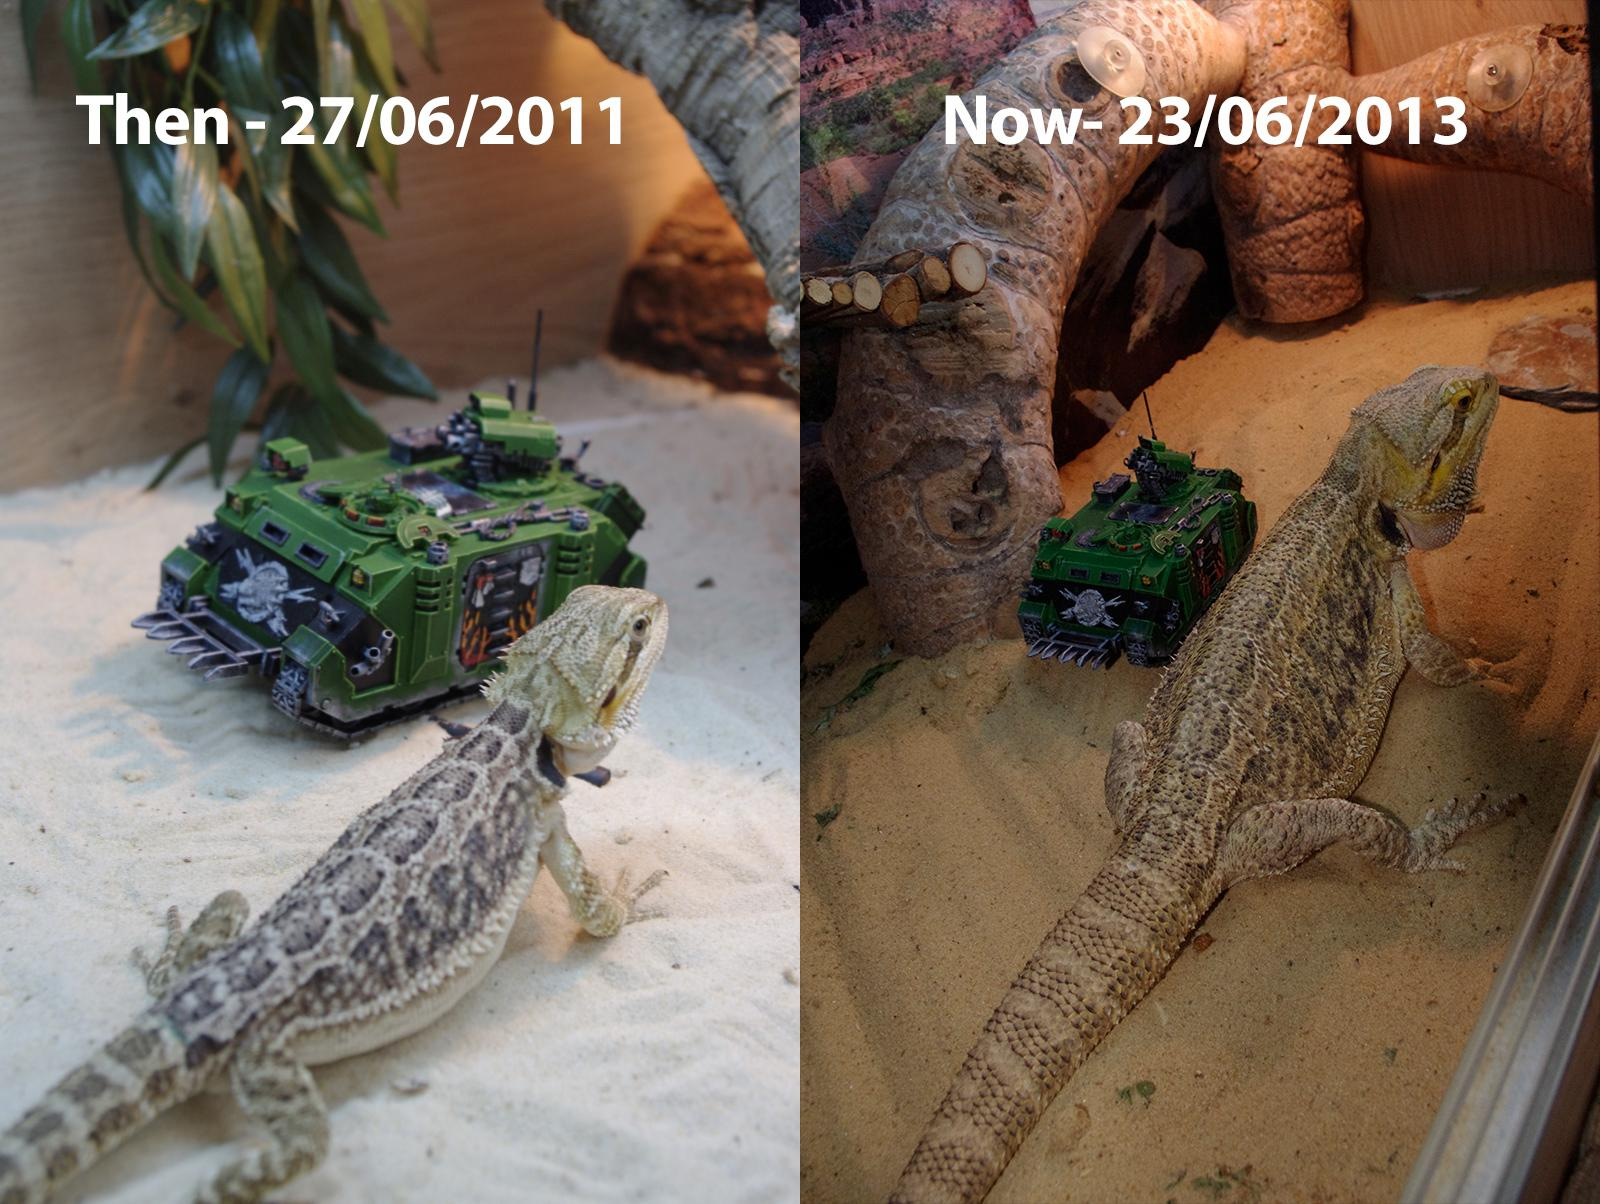 2011, 2013, All Grown Up, Cheese, Lizard, Predator, Stigweard, Warhammer 40,000